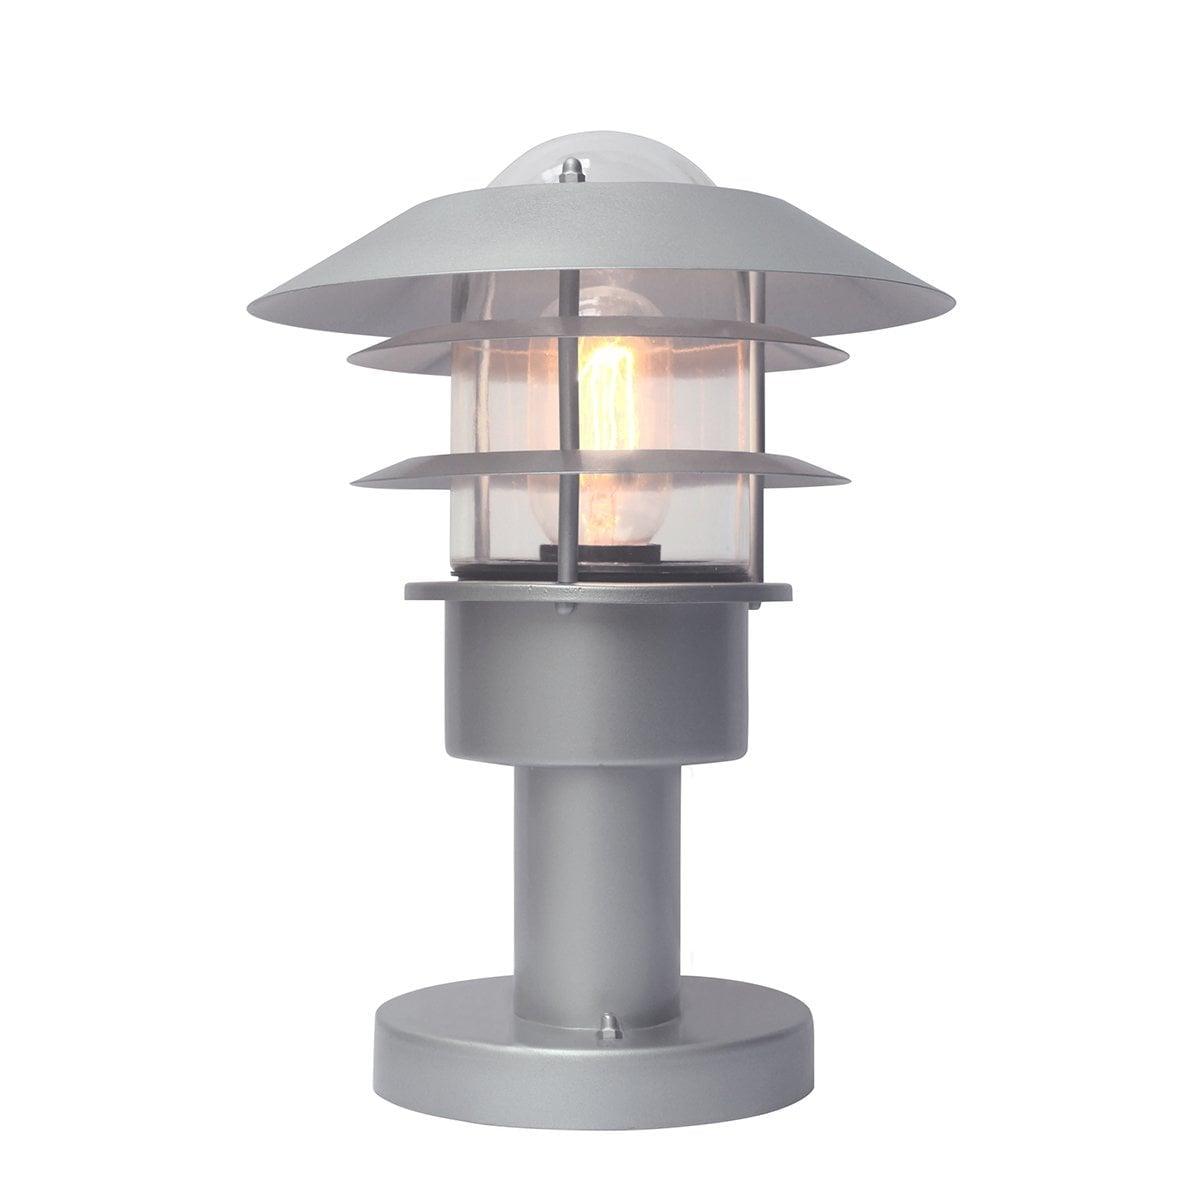 Elstead HELSINGORPED Helsingor Pedestal Lantern